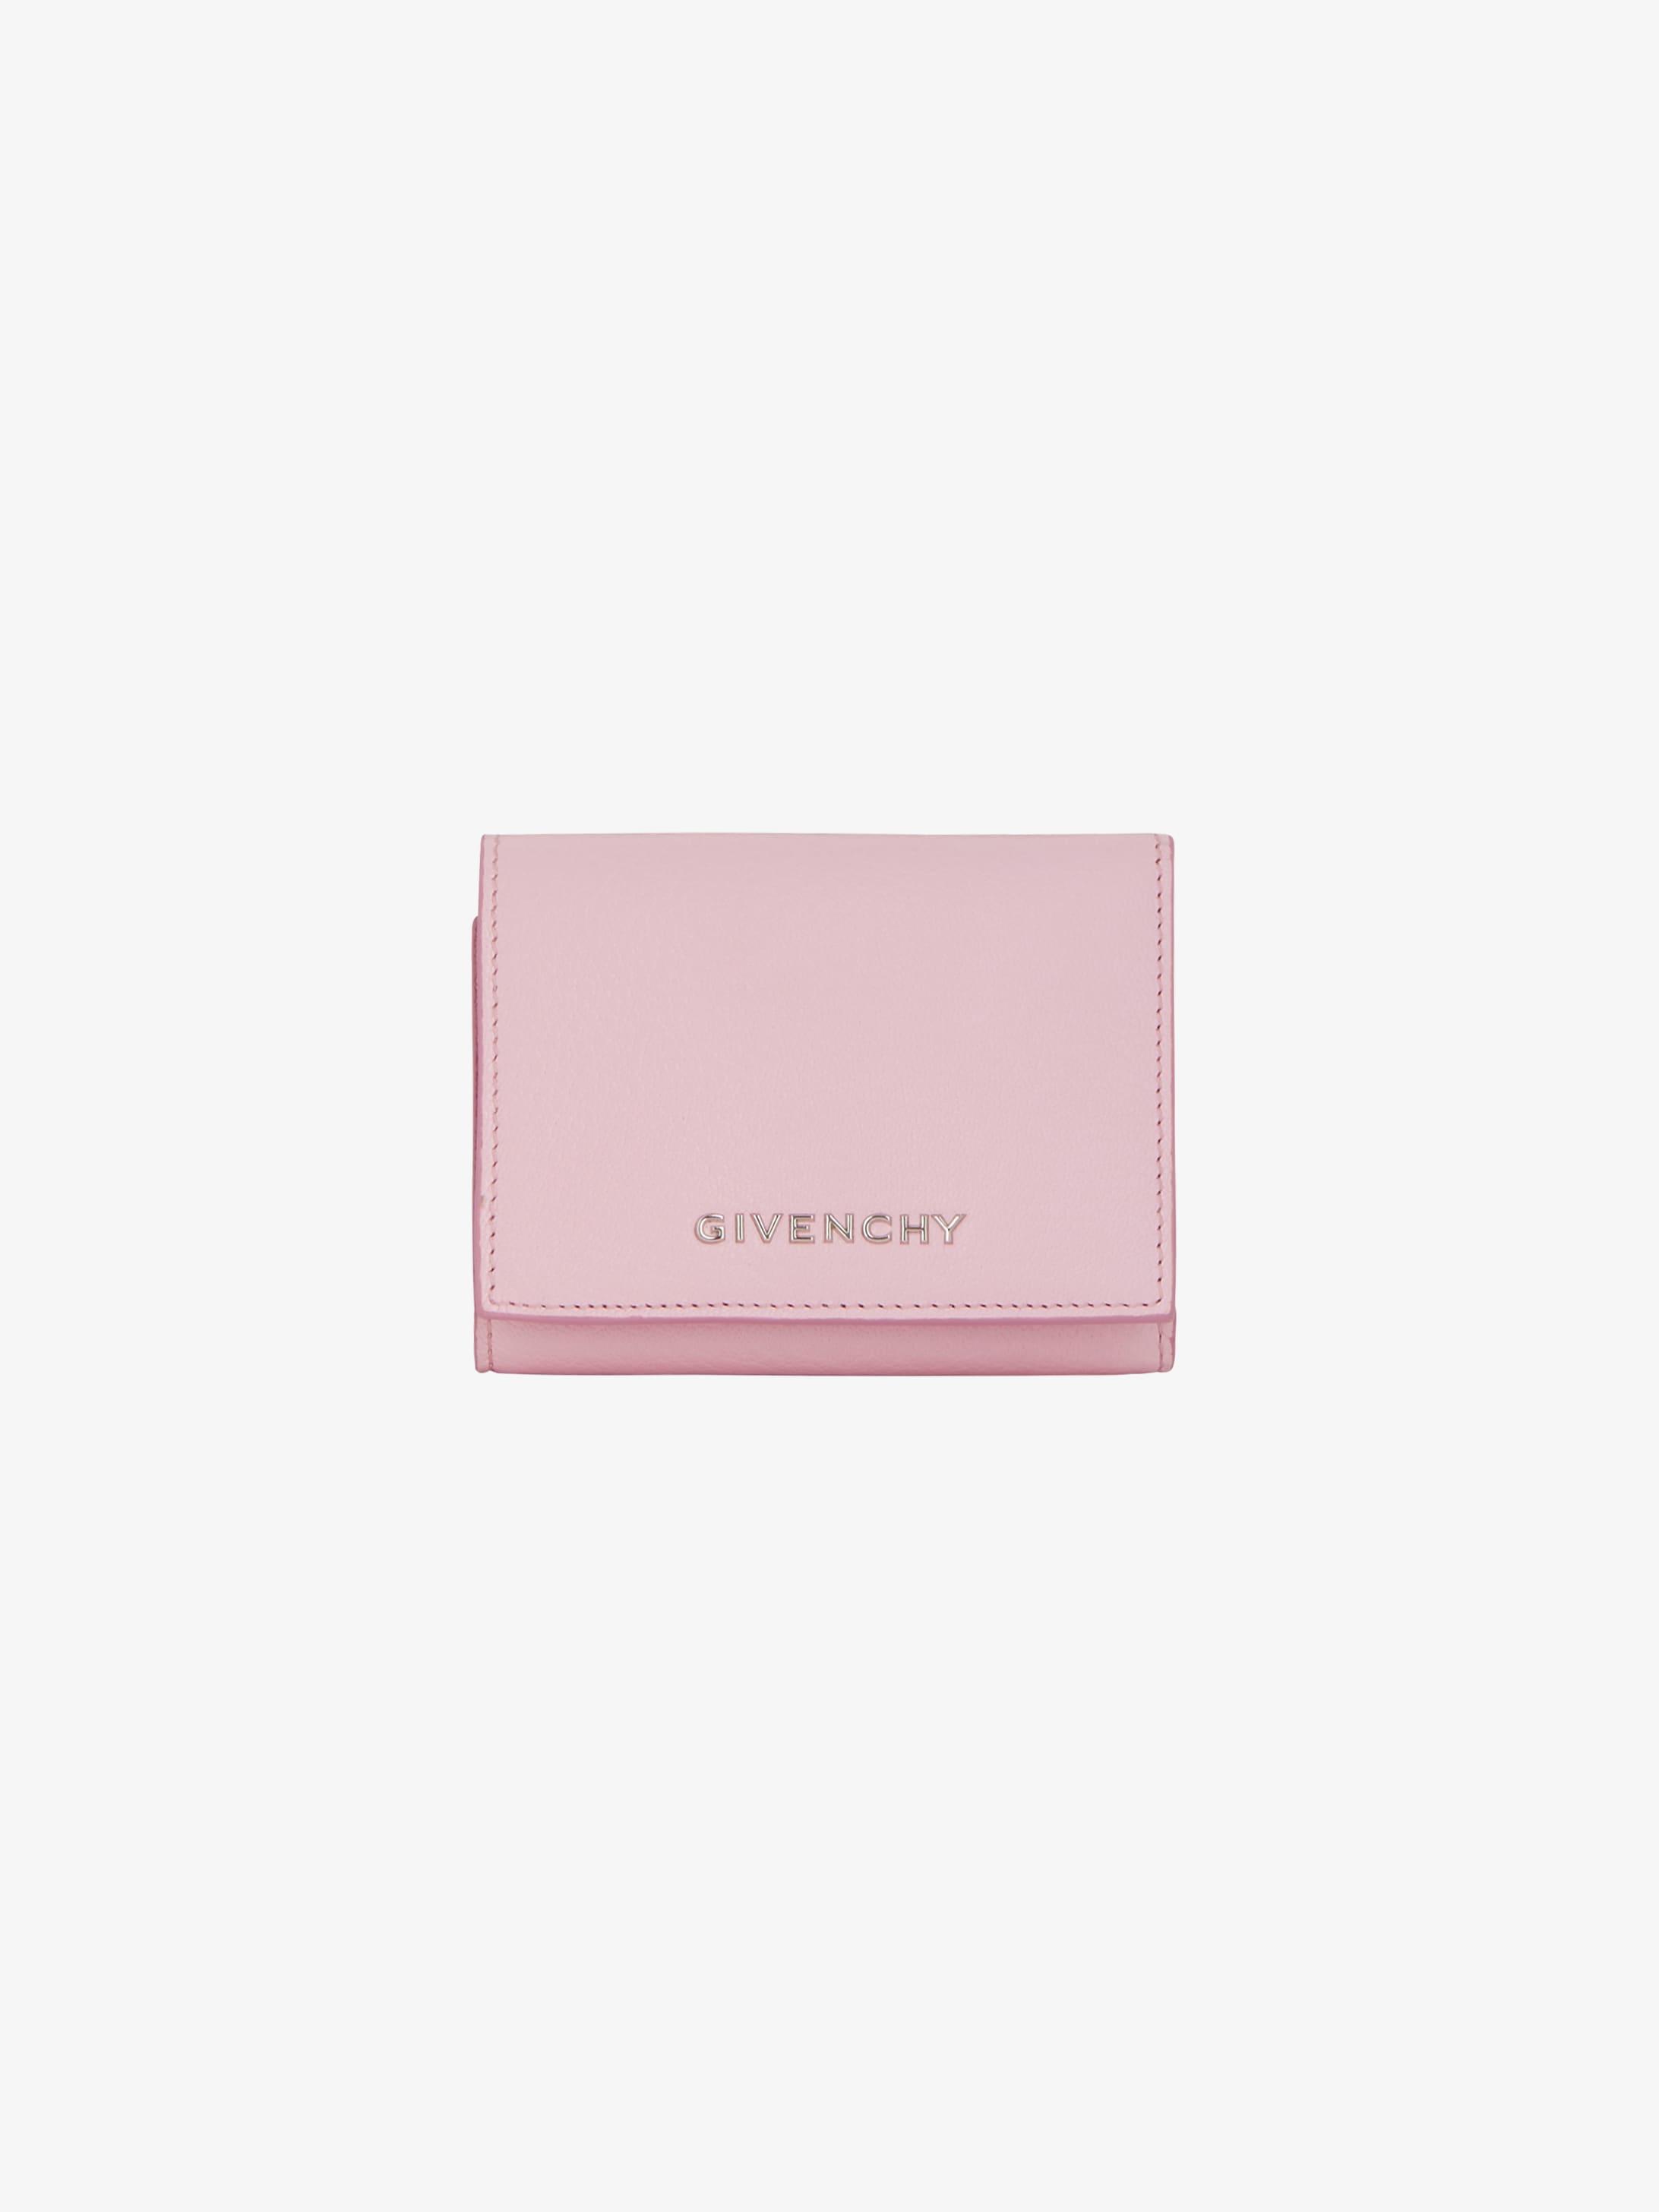 Pandora trifold wallet